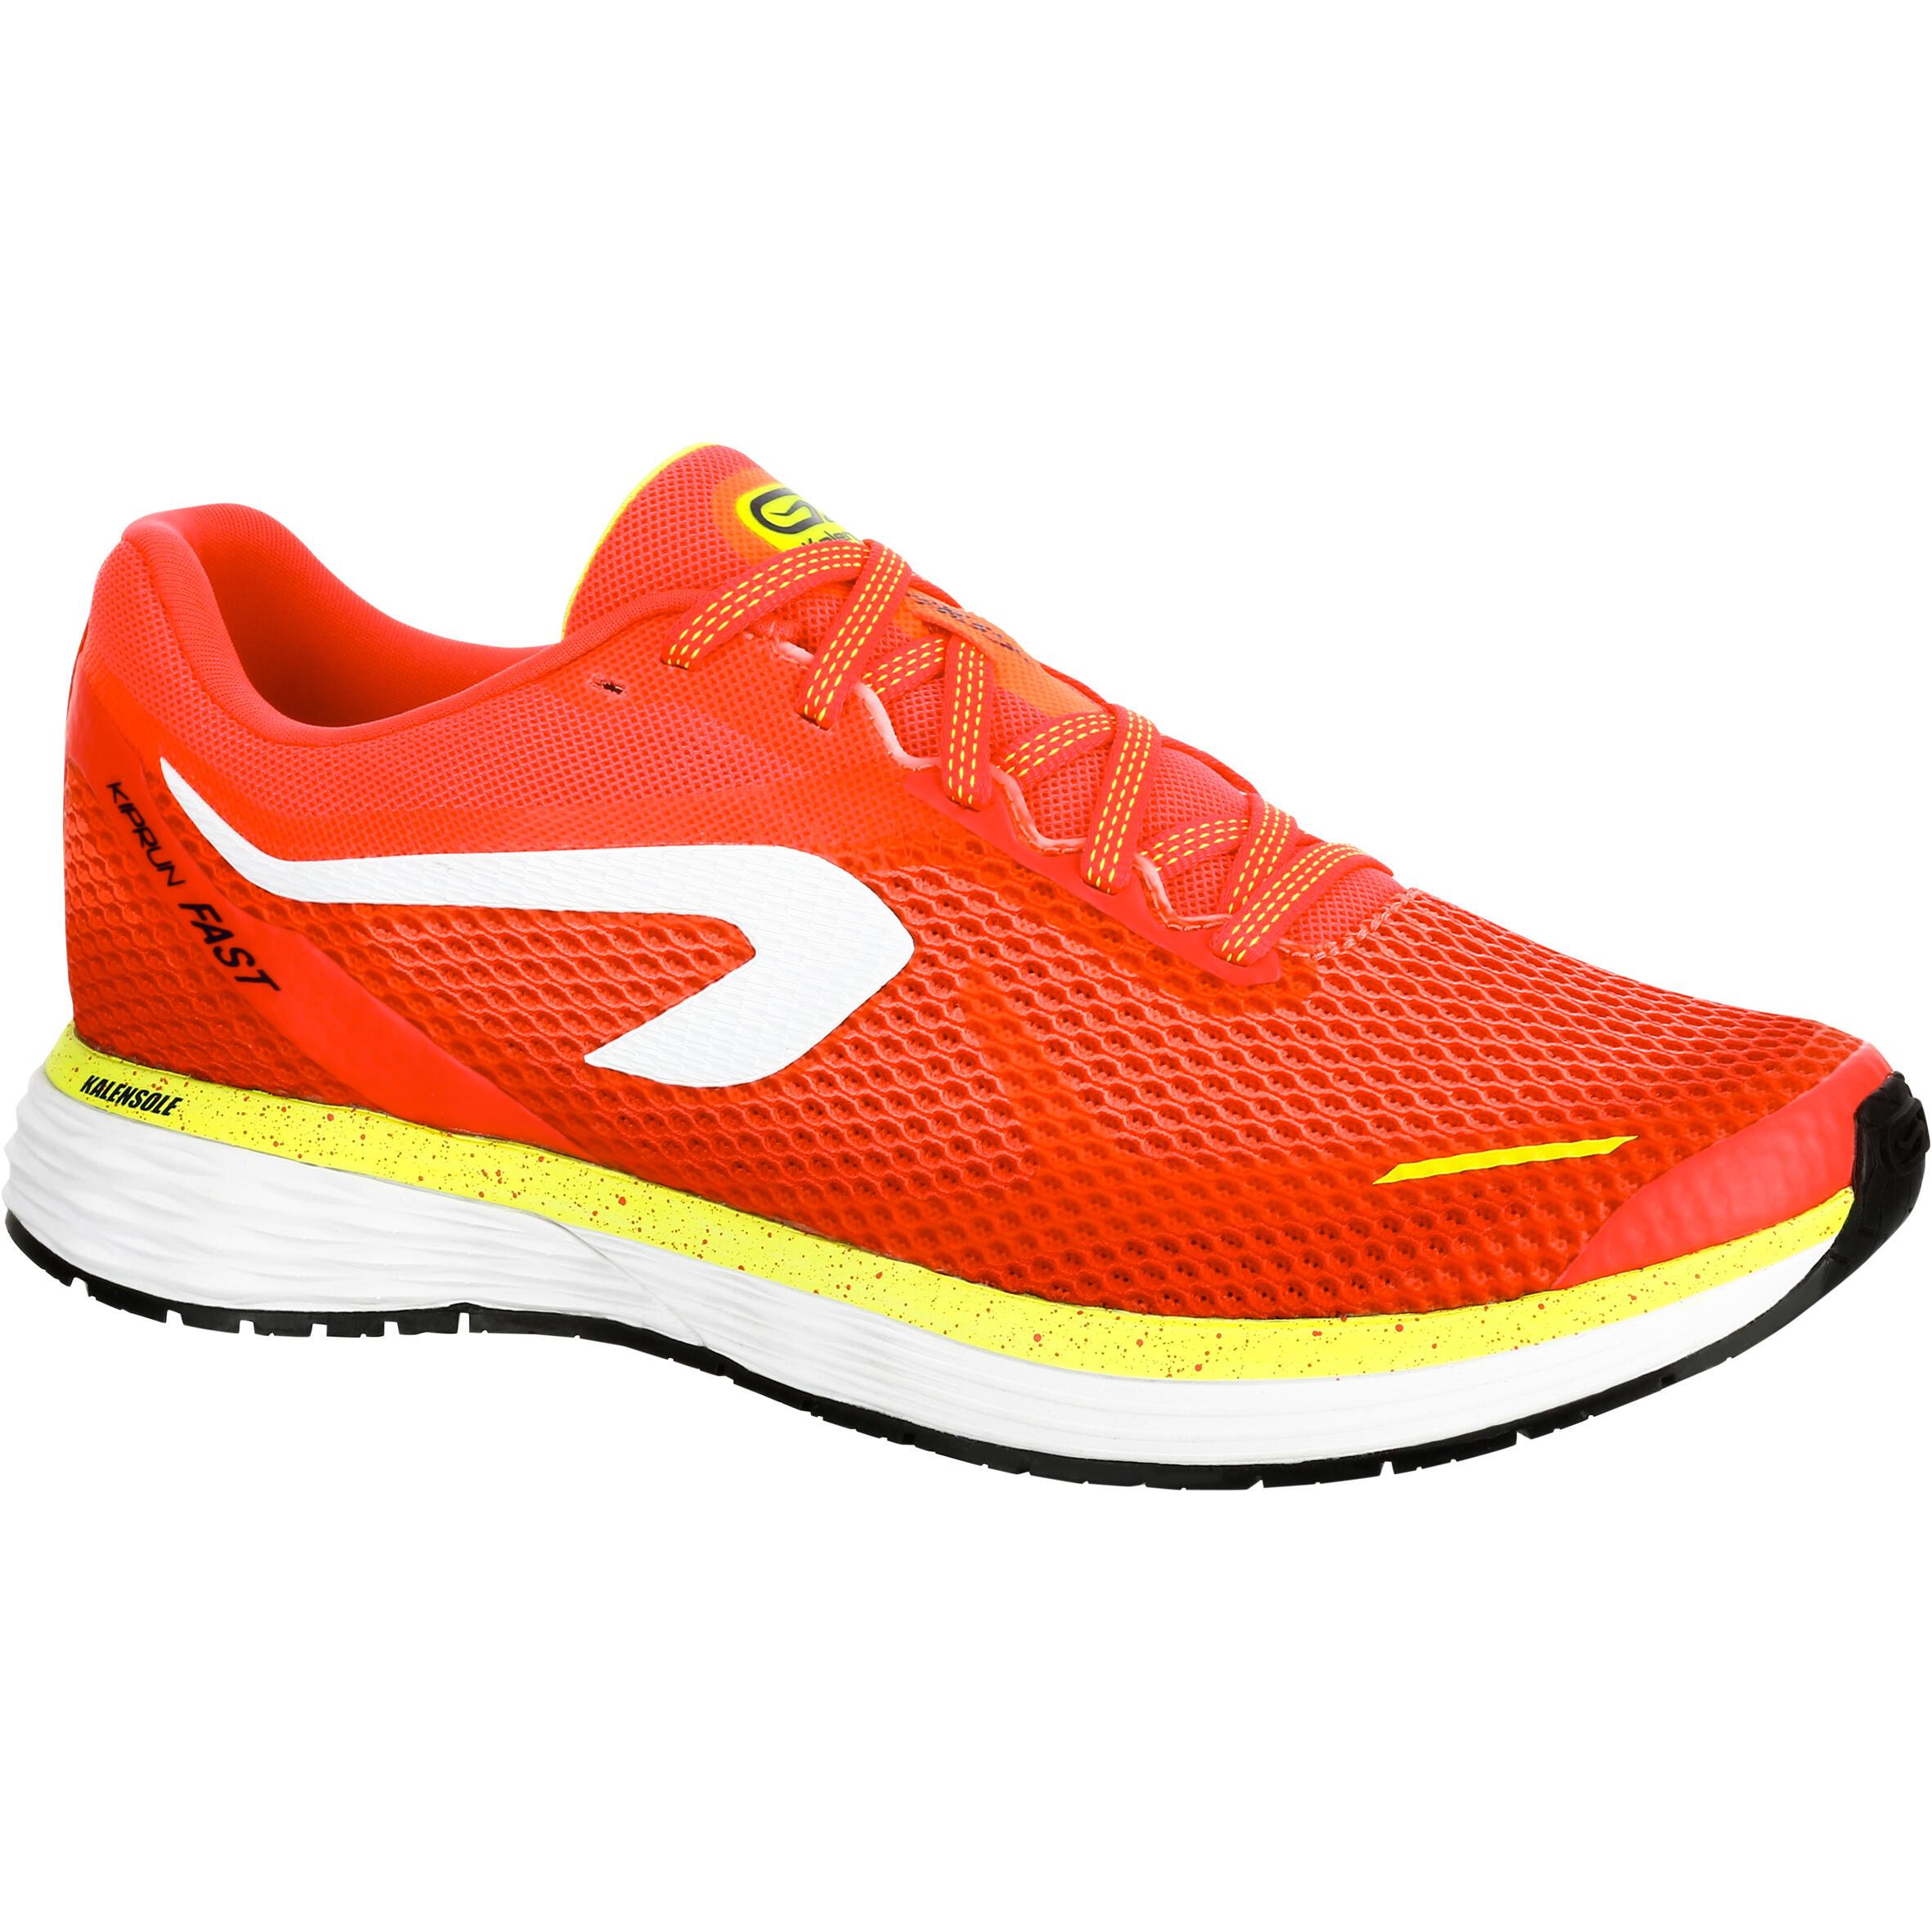 reputable site 548e5 bf3df Chaussures running Femmes   Decathlon